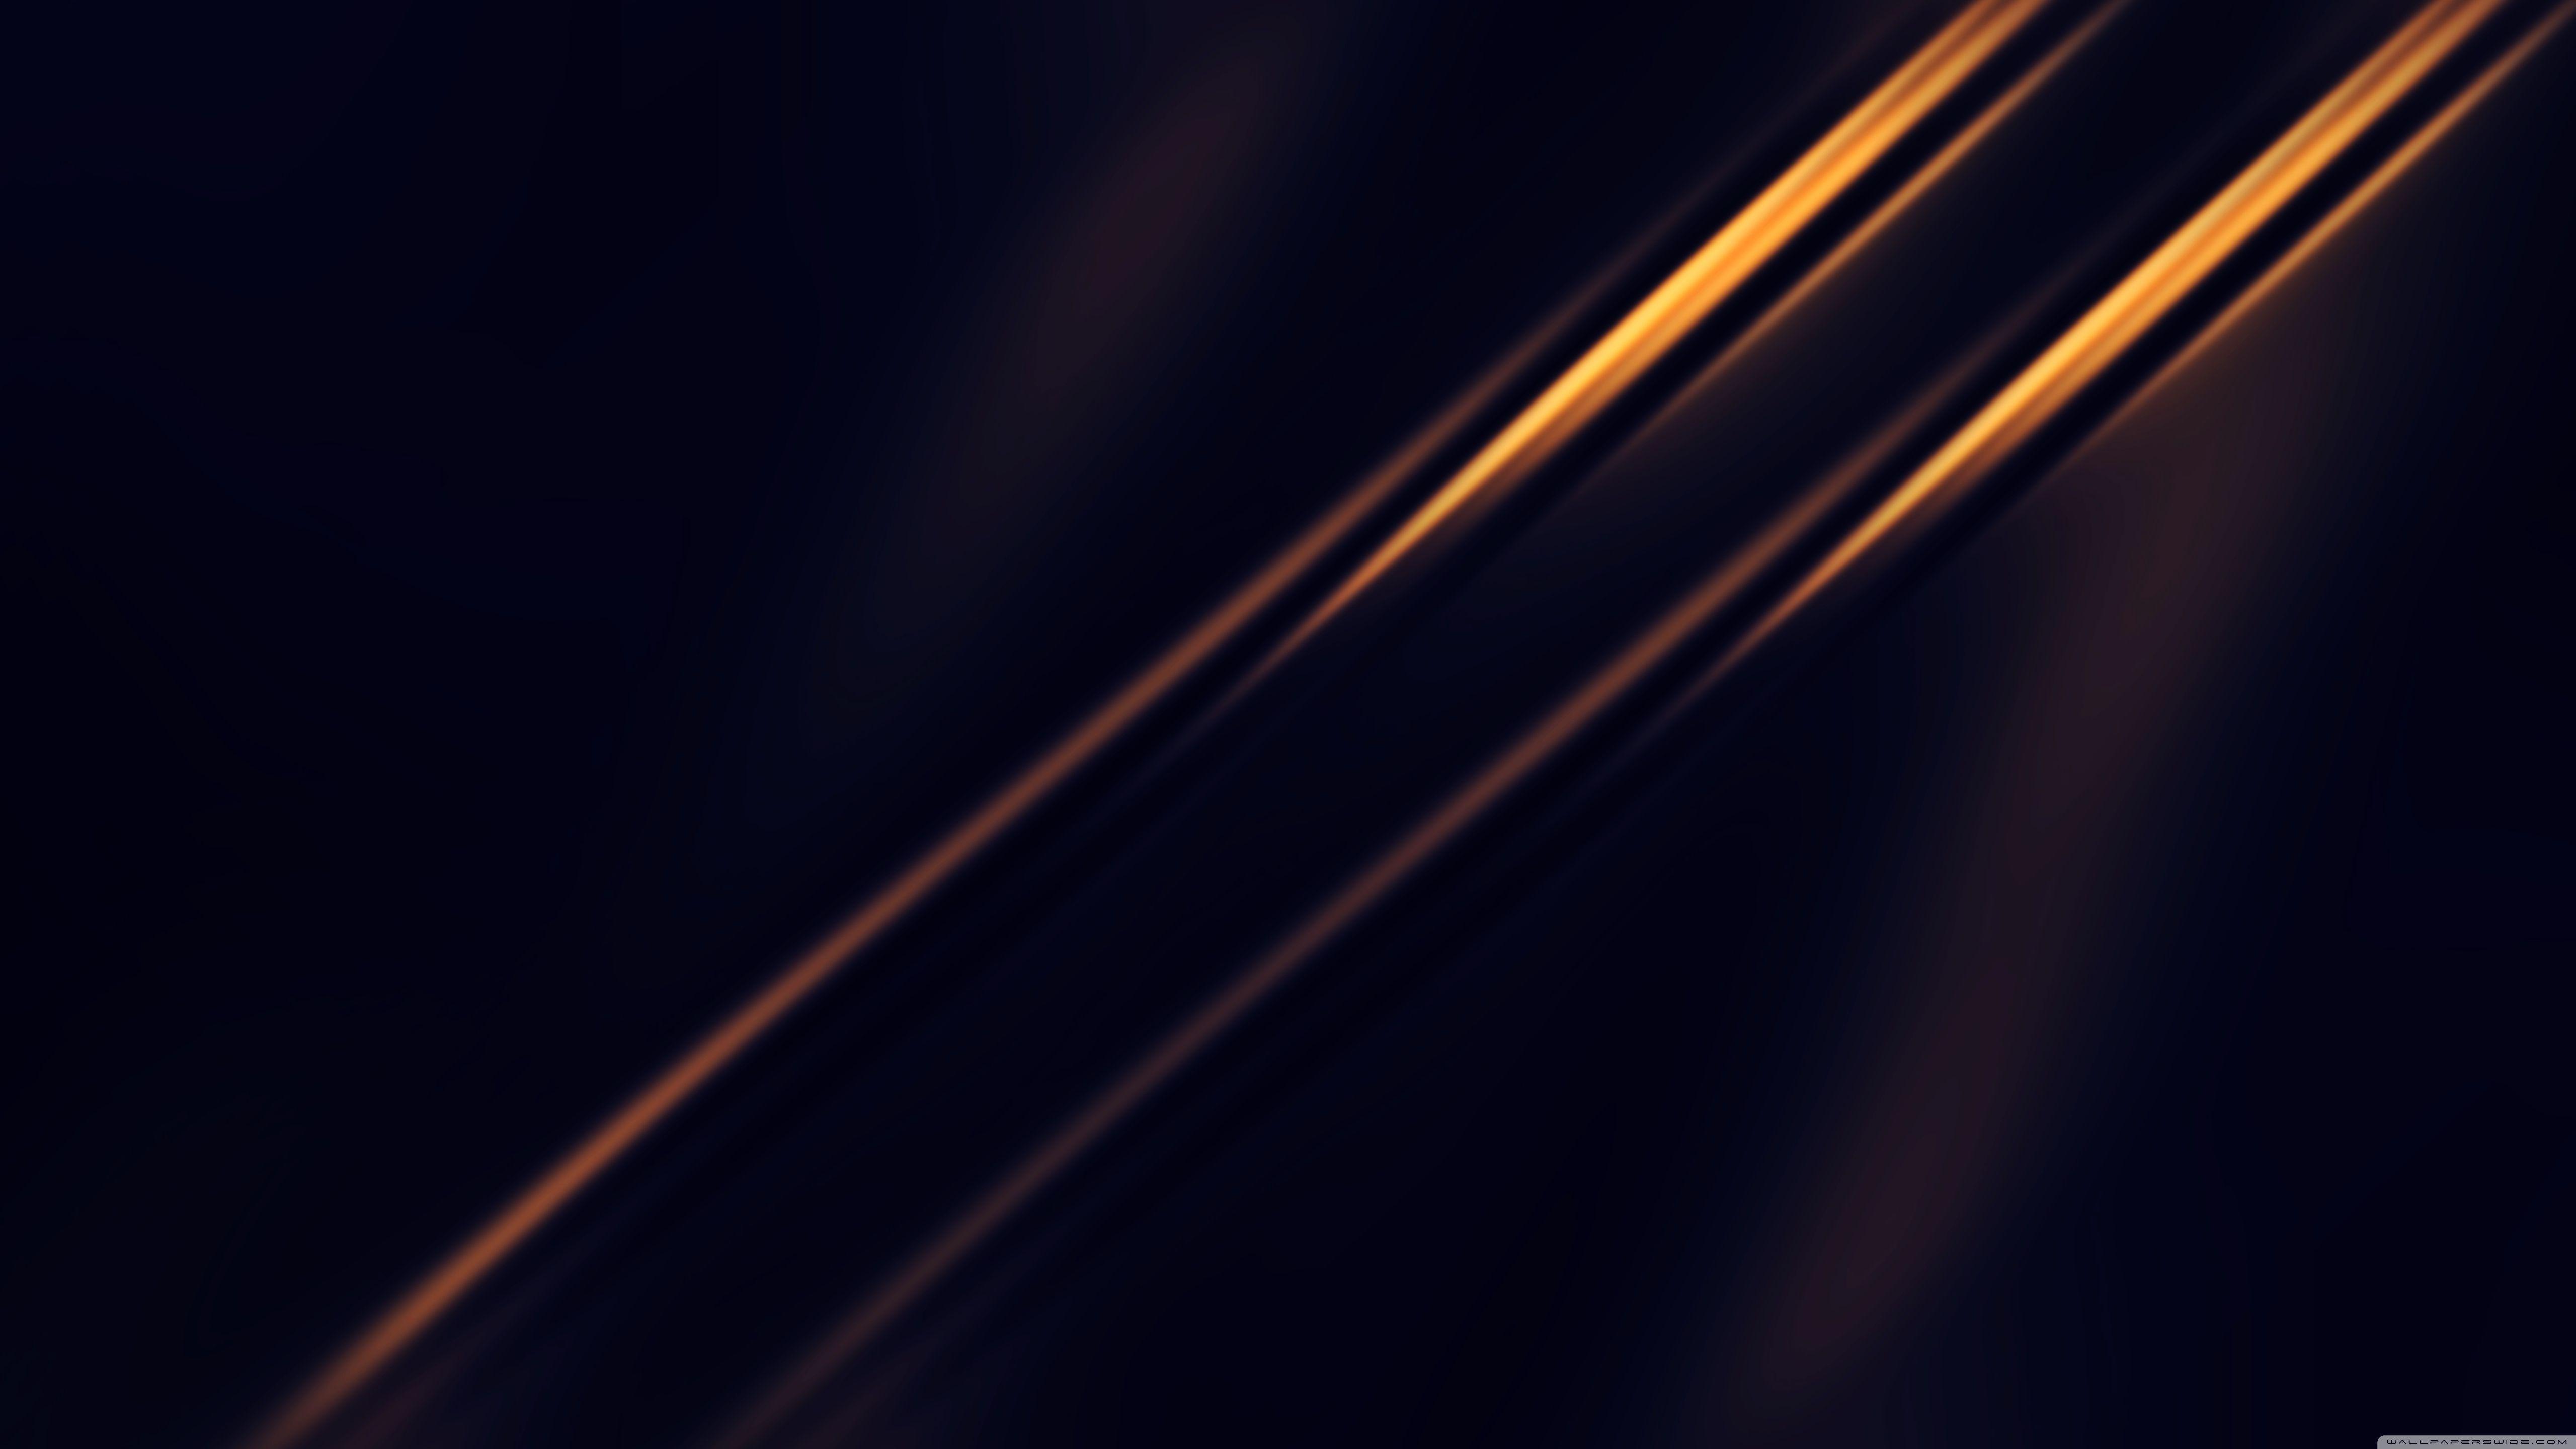 Ultra HD Black Wallpapers - Top Free Ultra HD Black Backgrounds